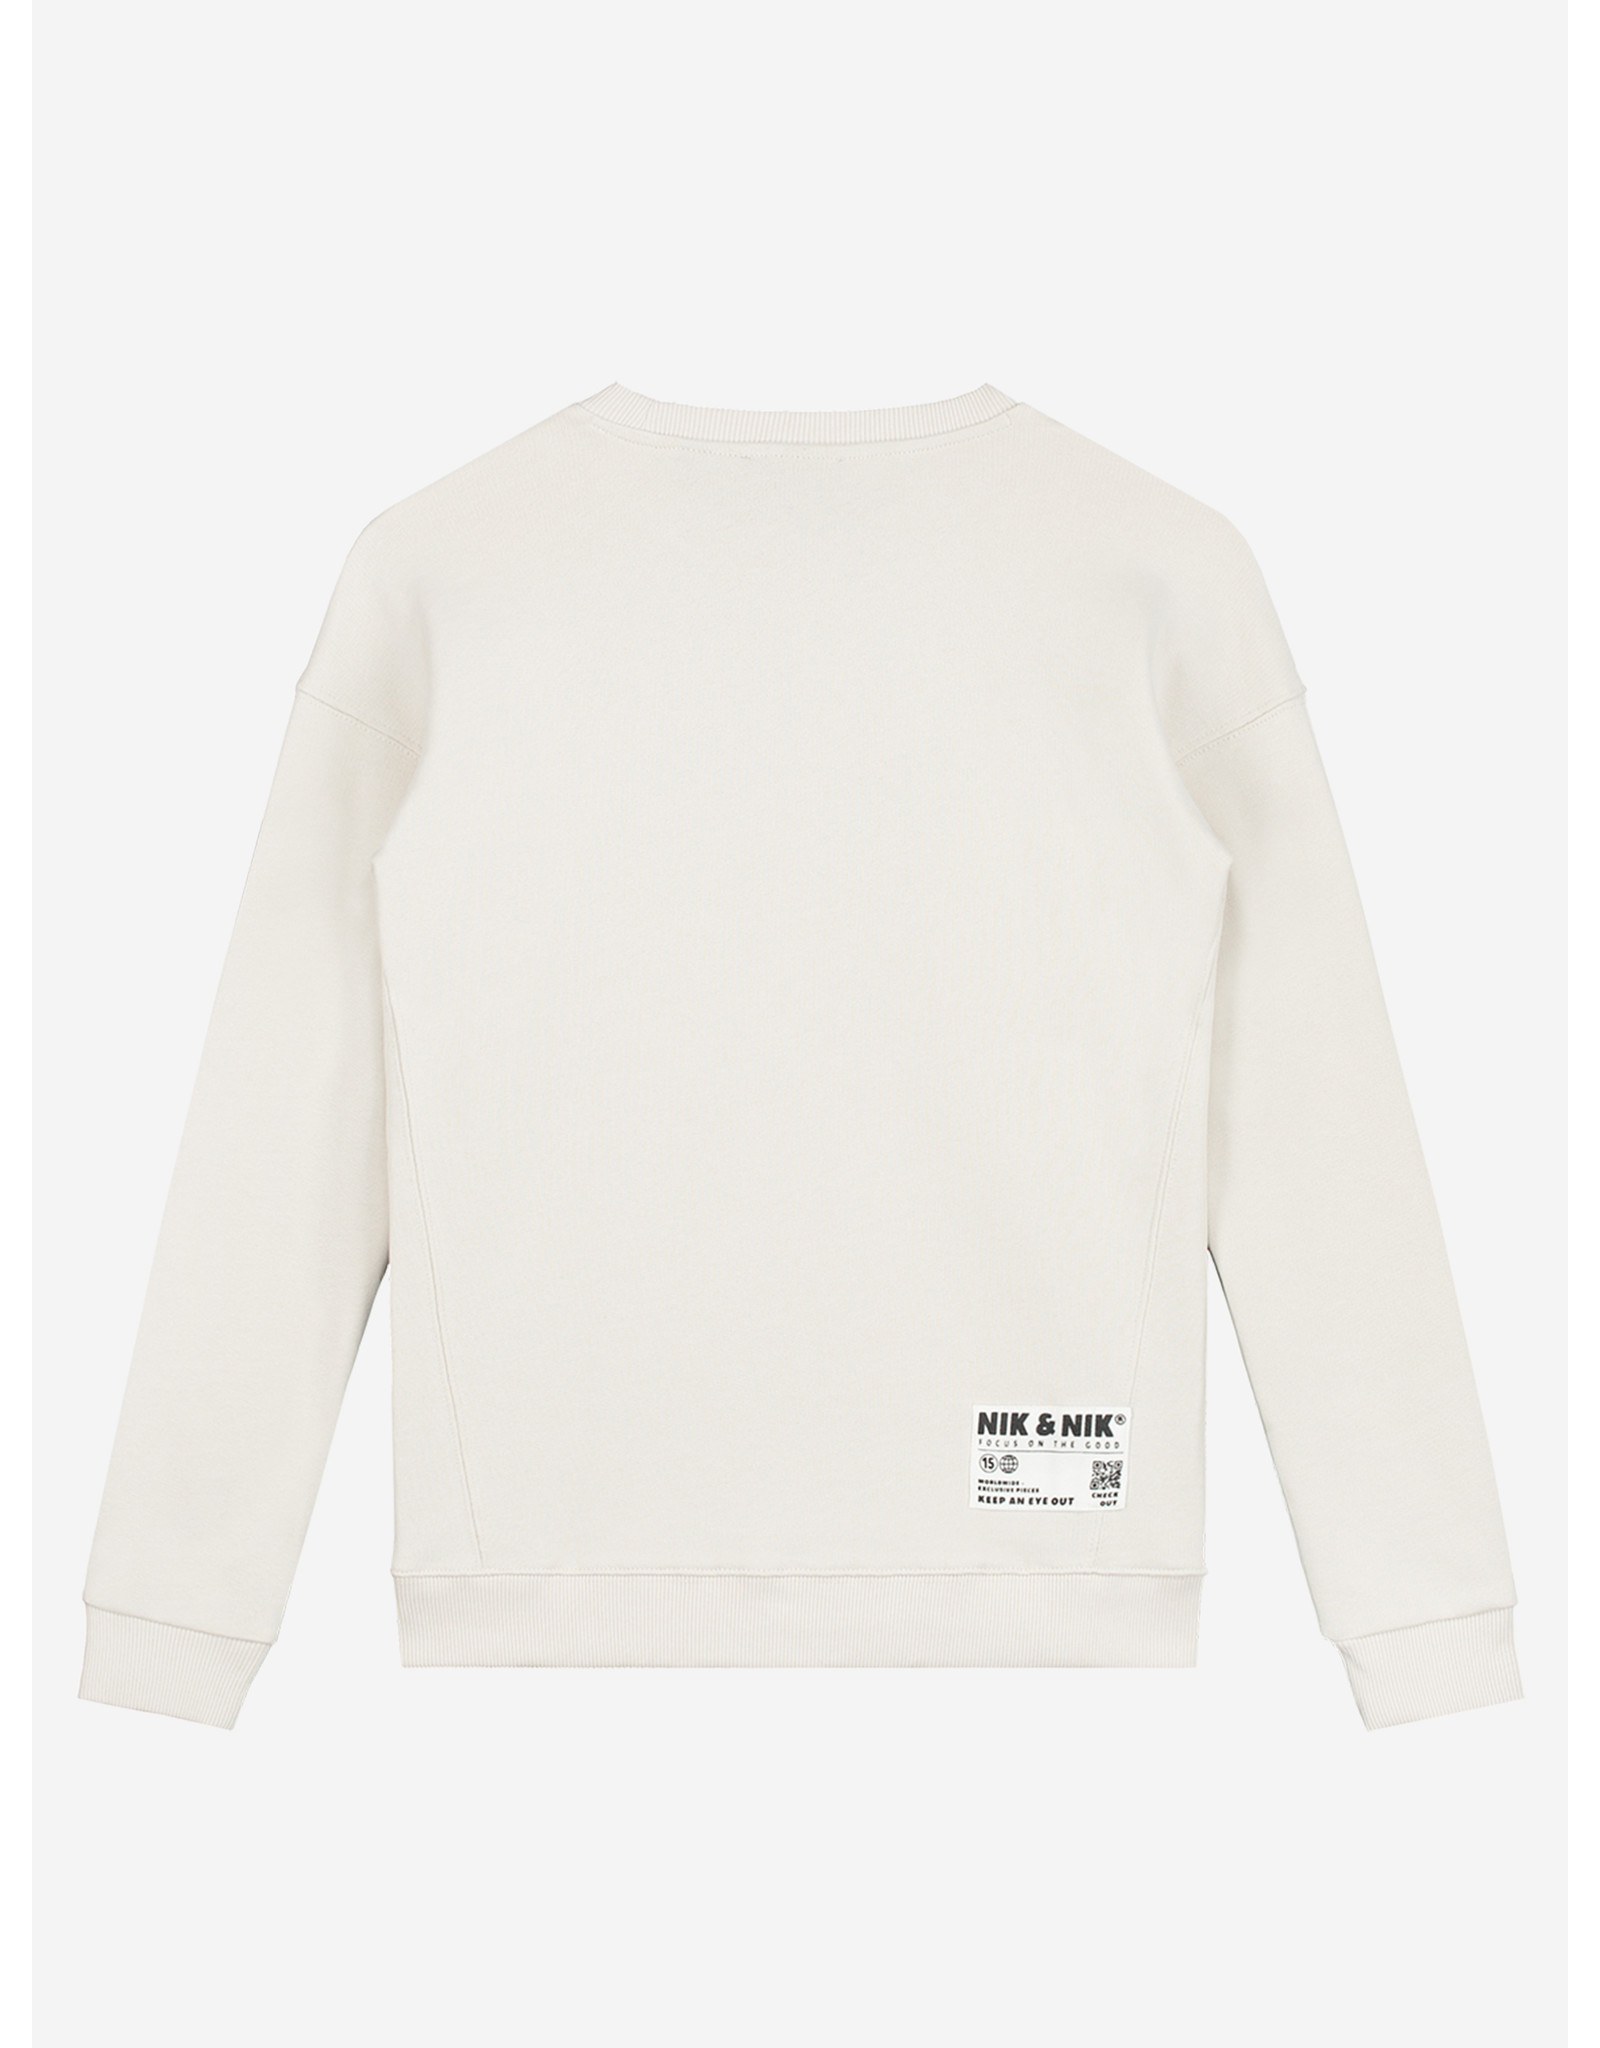 Nik & Nik Milo Sweater Dusty White